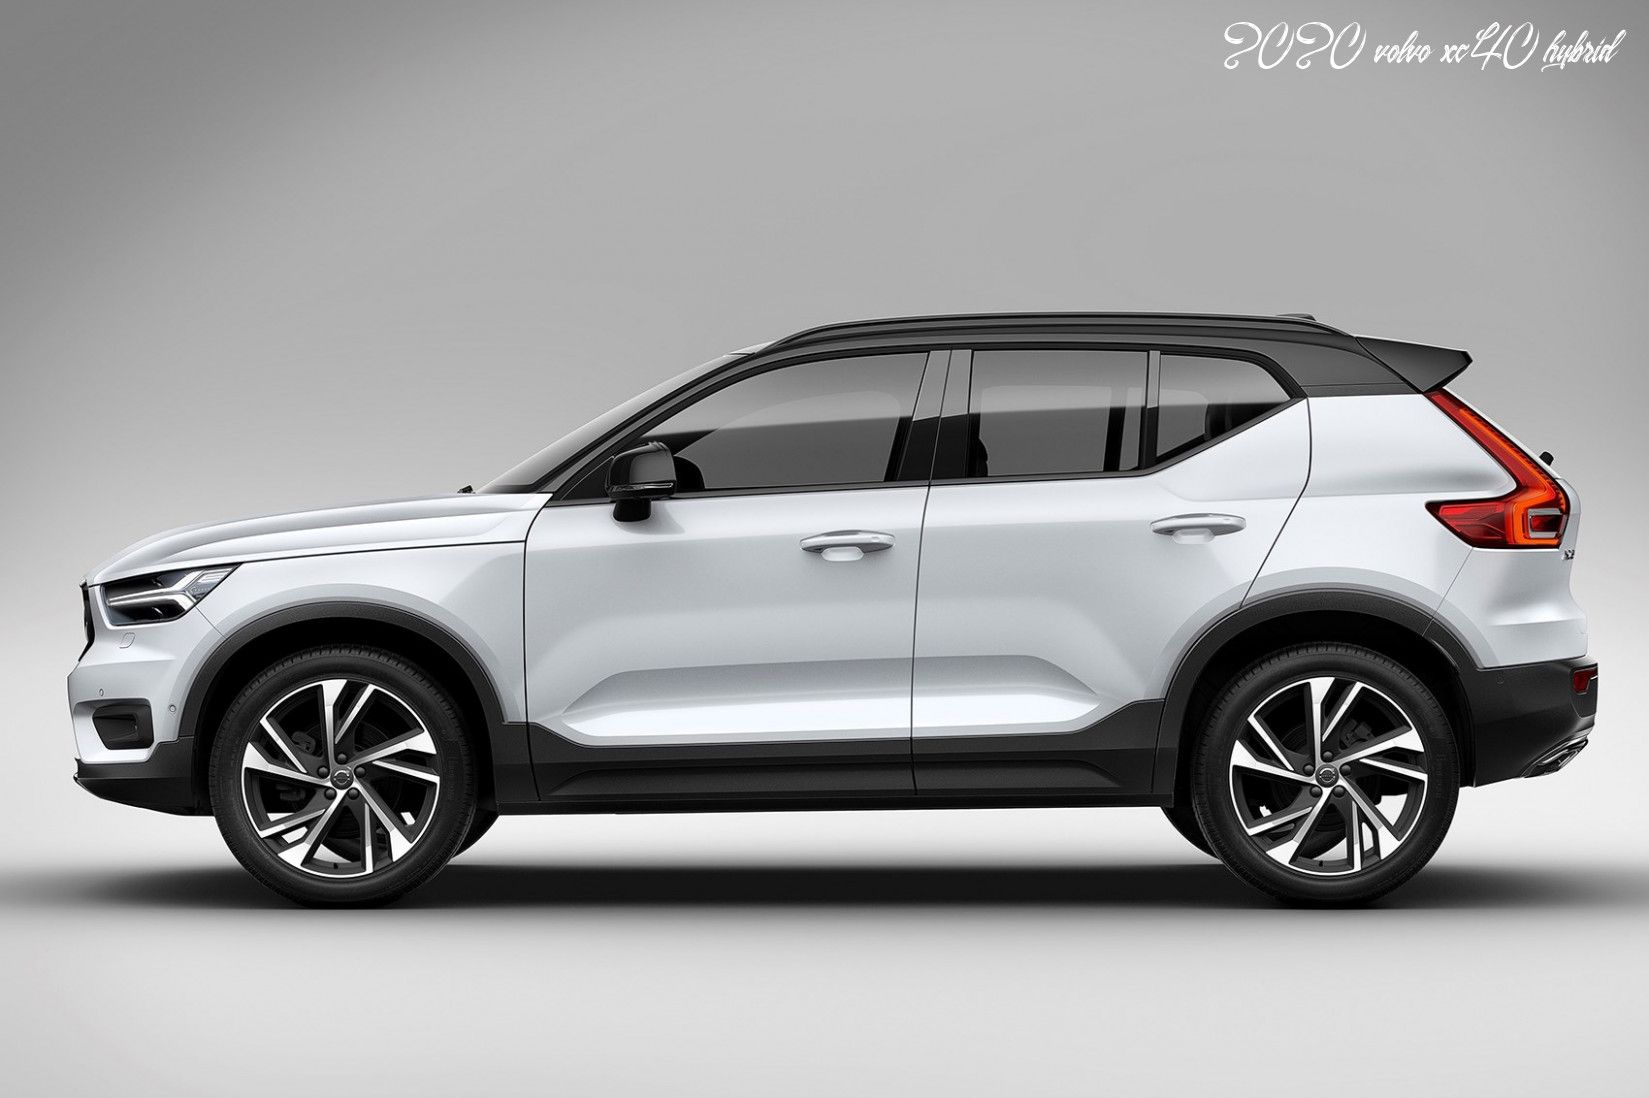 2020 Volvo Xc40 Hybrid In 2020 Volvo Volvo Xc Dream Cars